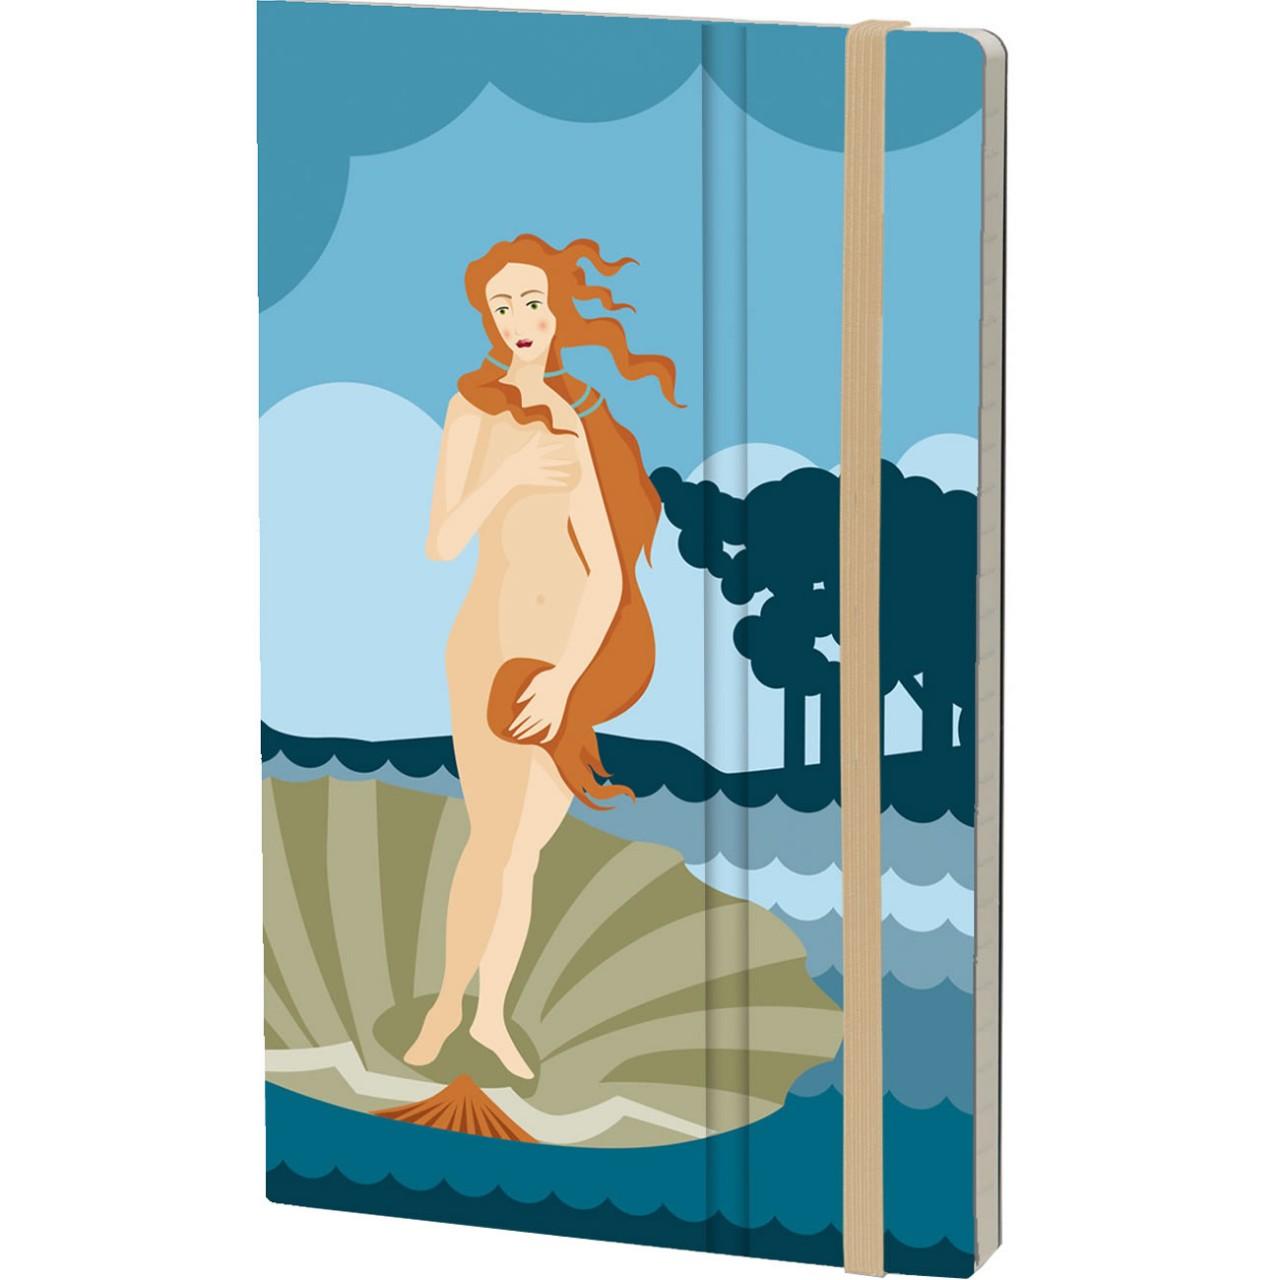 Stifflexible Notizbuch ART 13 x 21 cm 192 S., BOTTICELLI